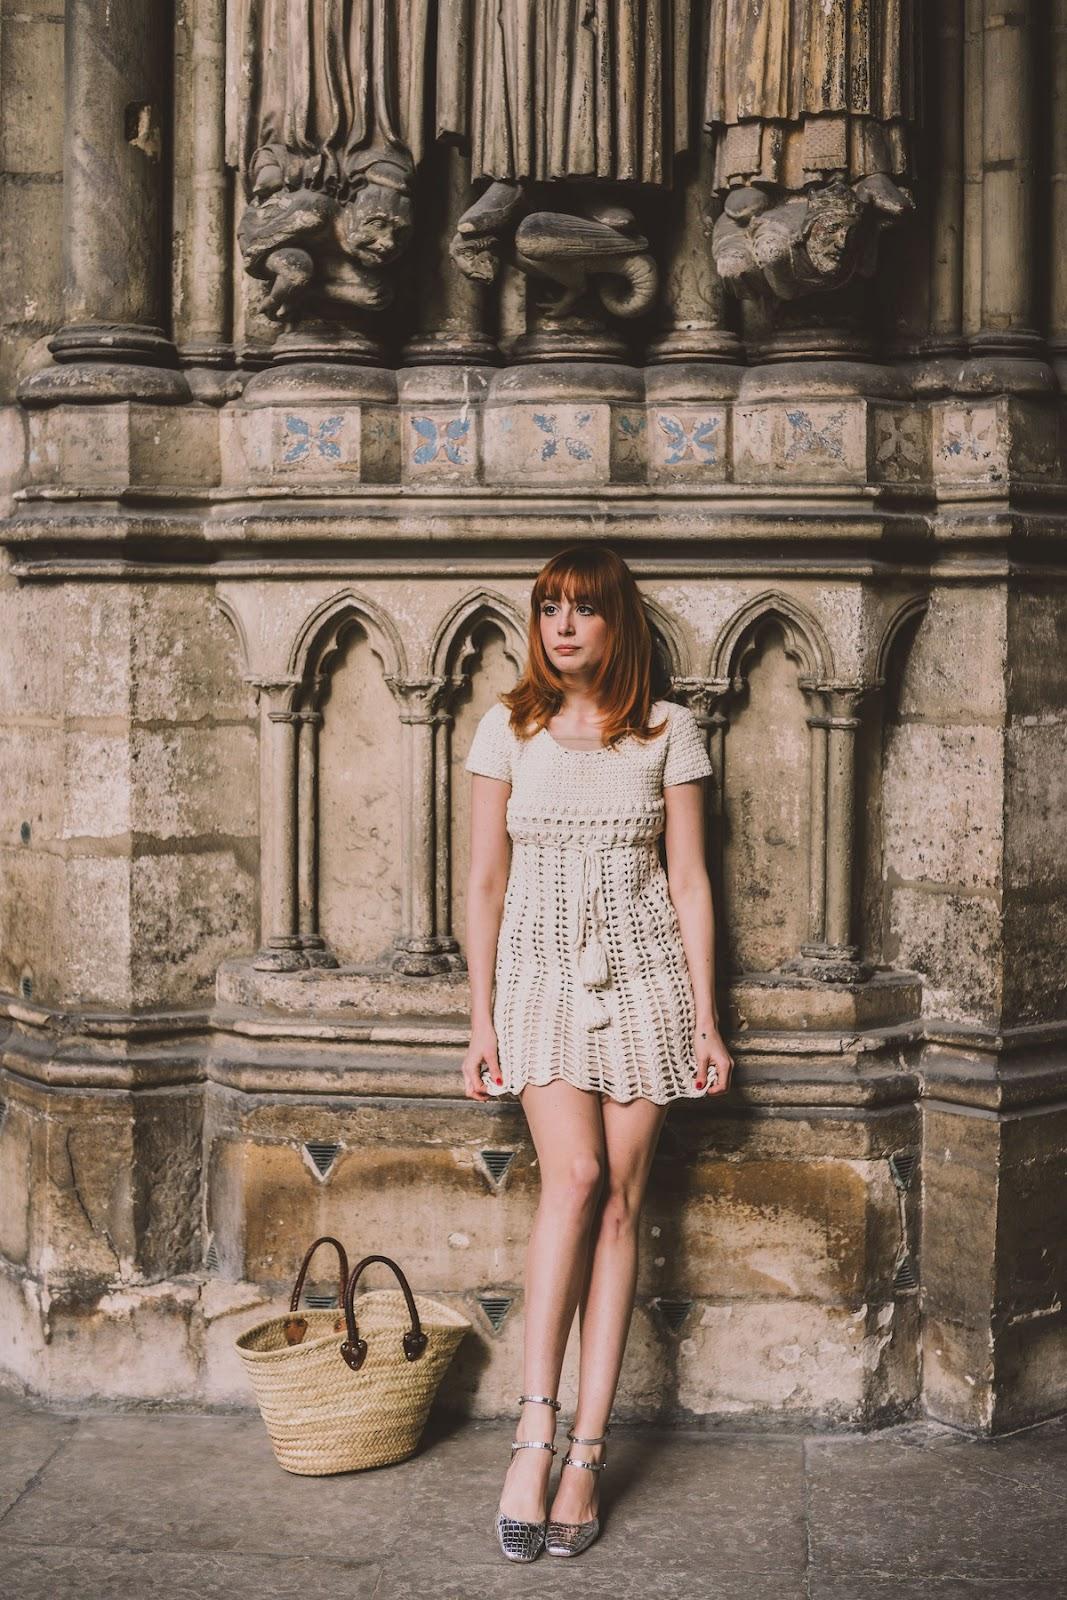 Pandora latest styles of dresses